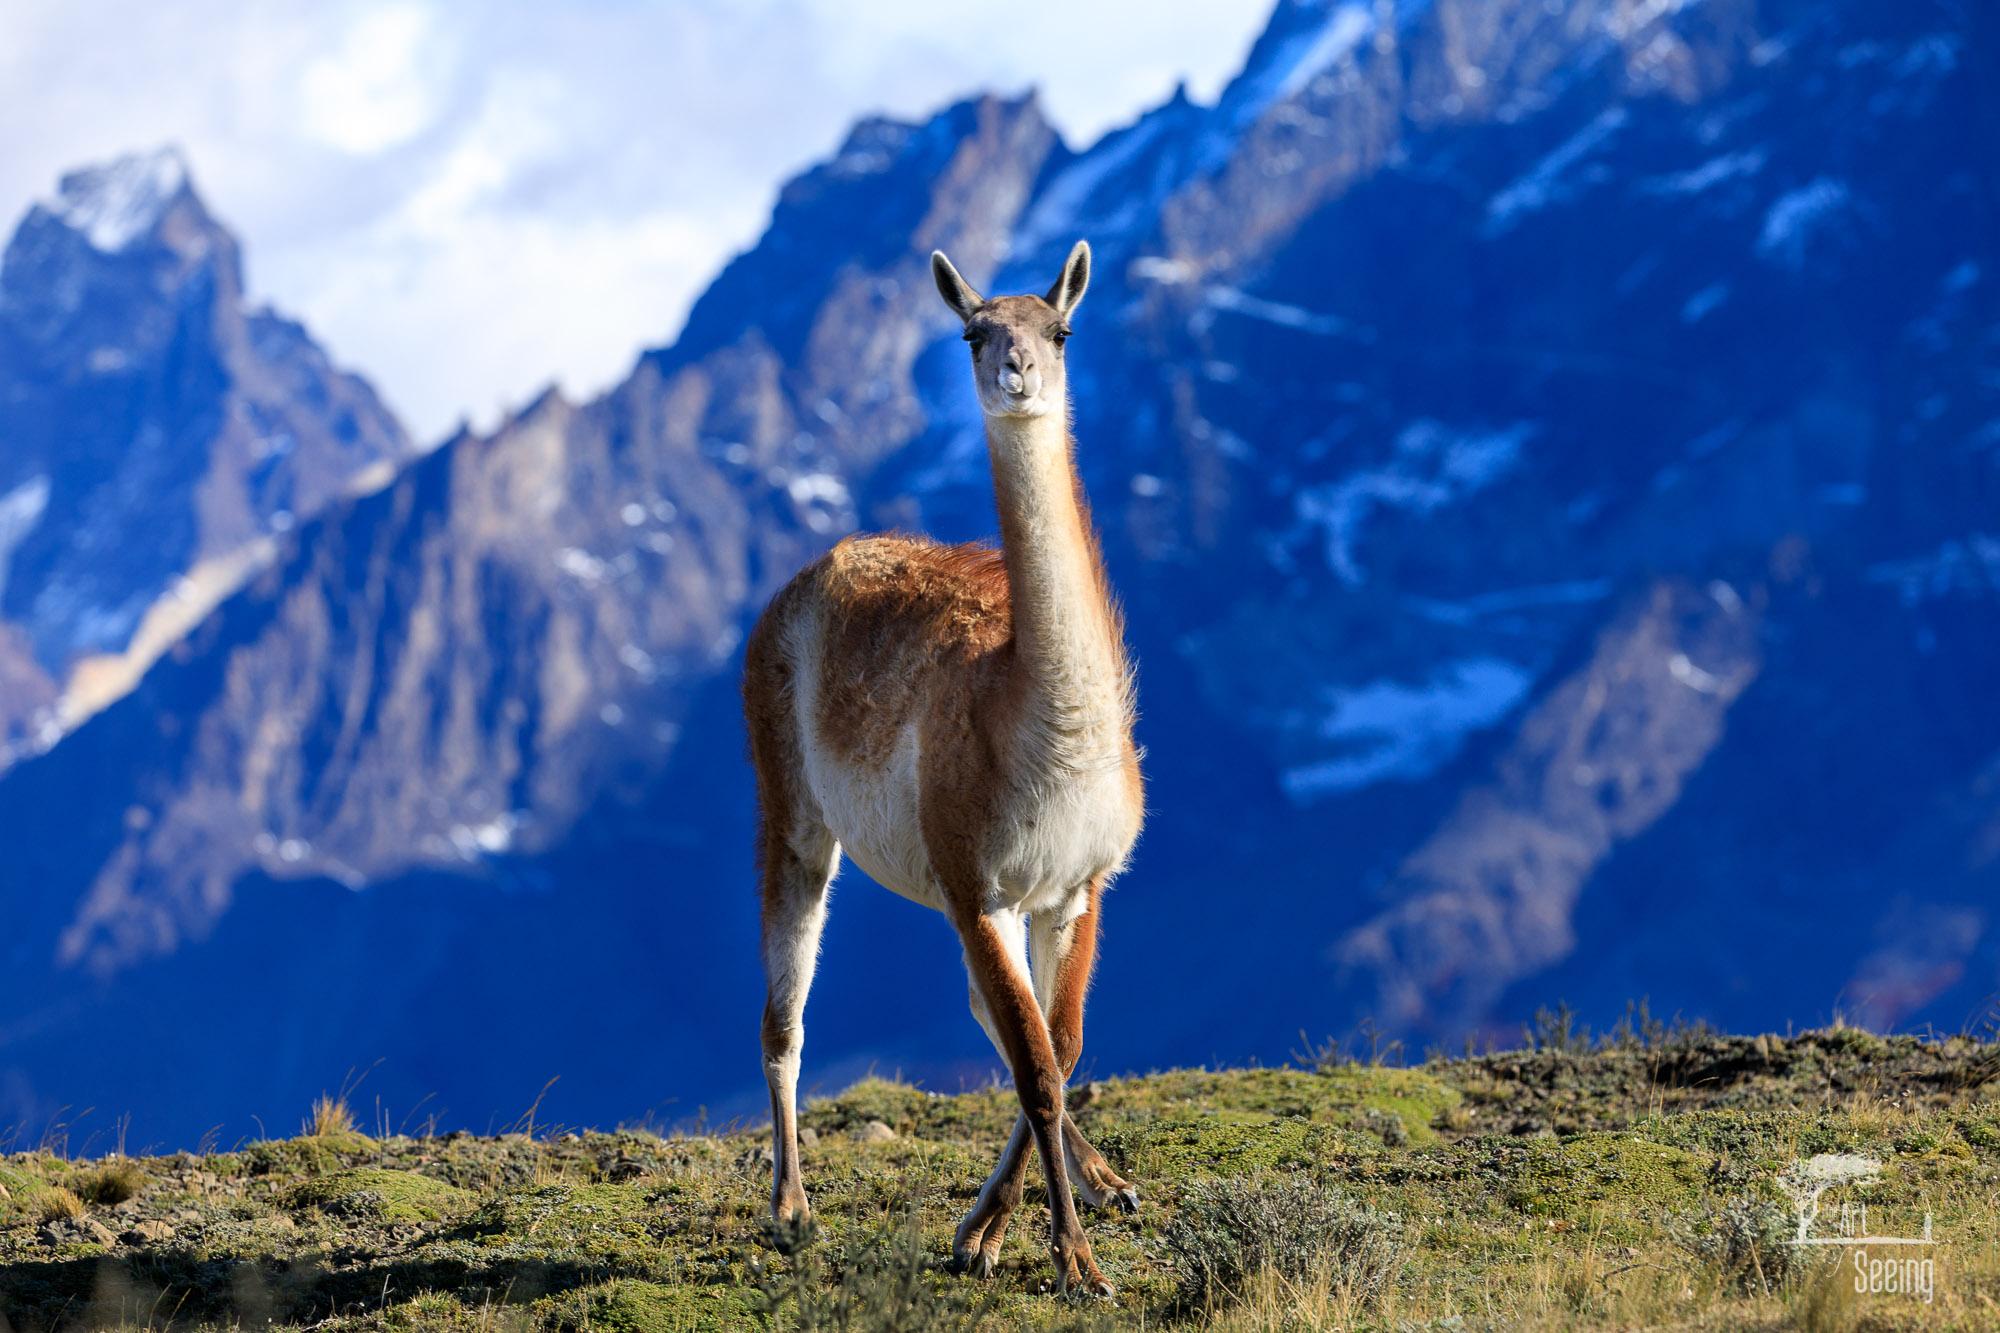 patagonia photography 1 image